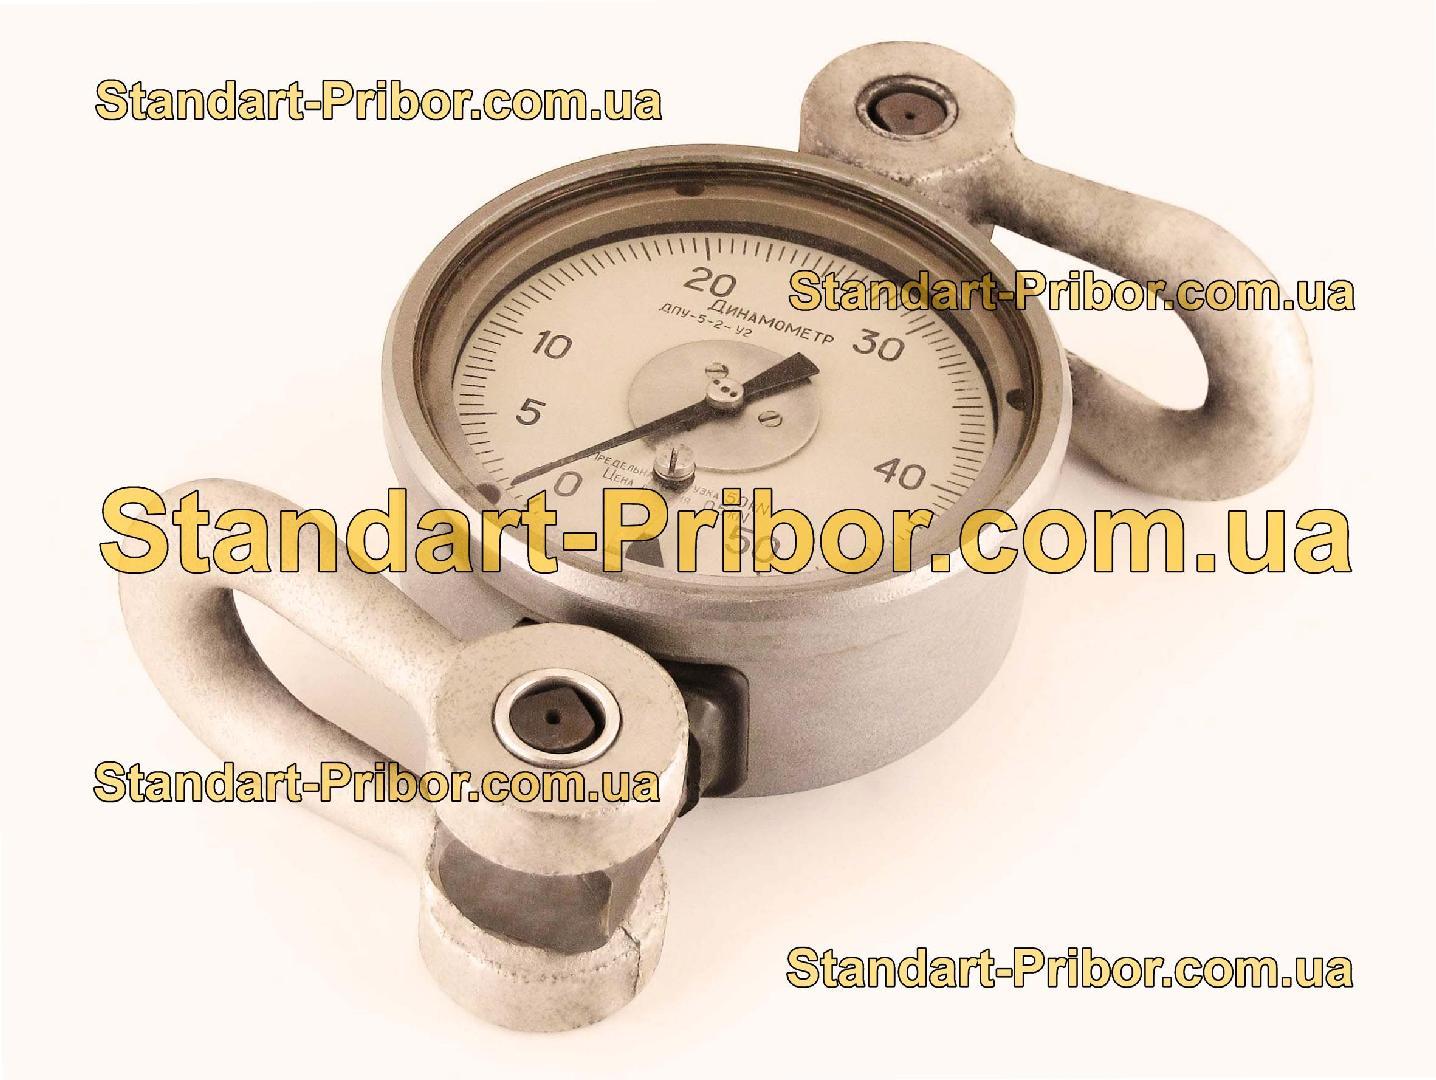 ДПУ-5-2 50 кН динамометр общего назначения - фотография 1